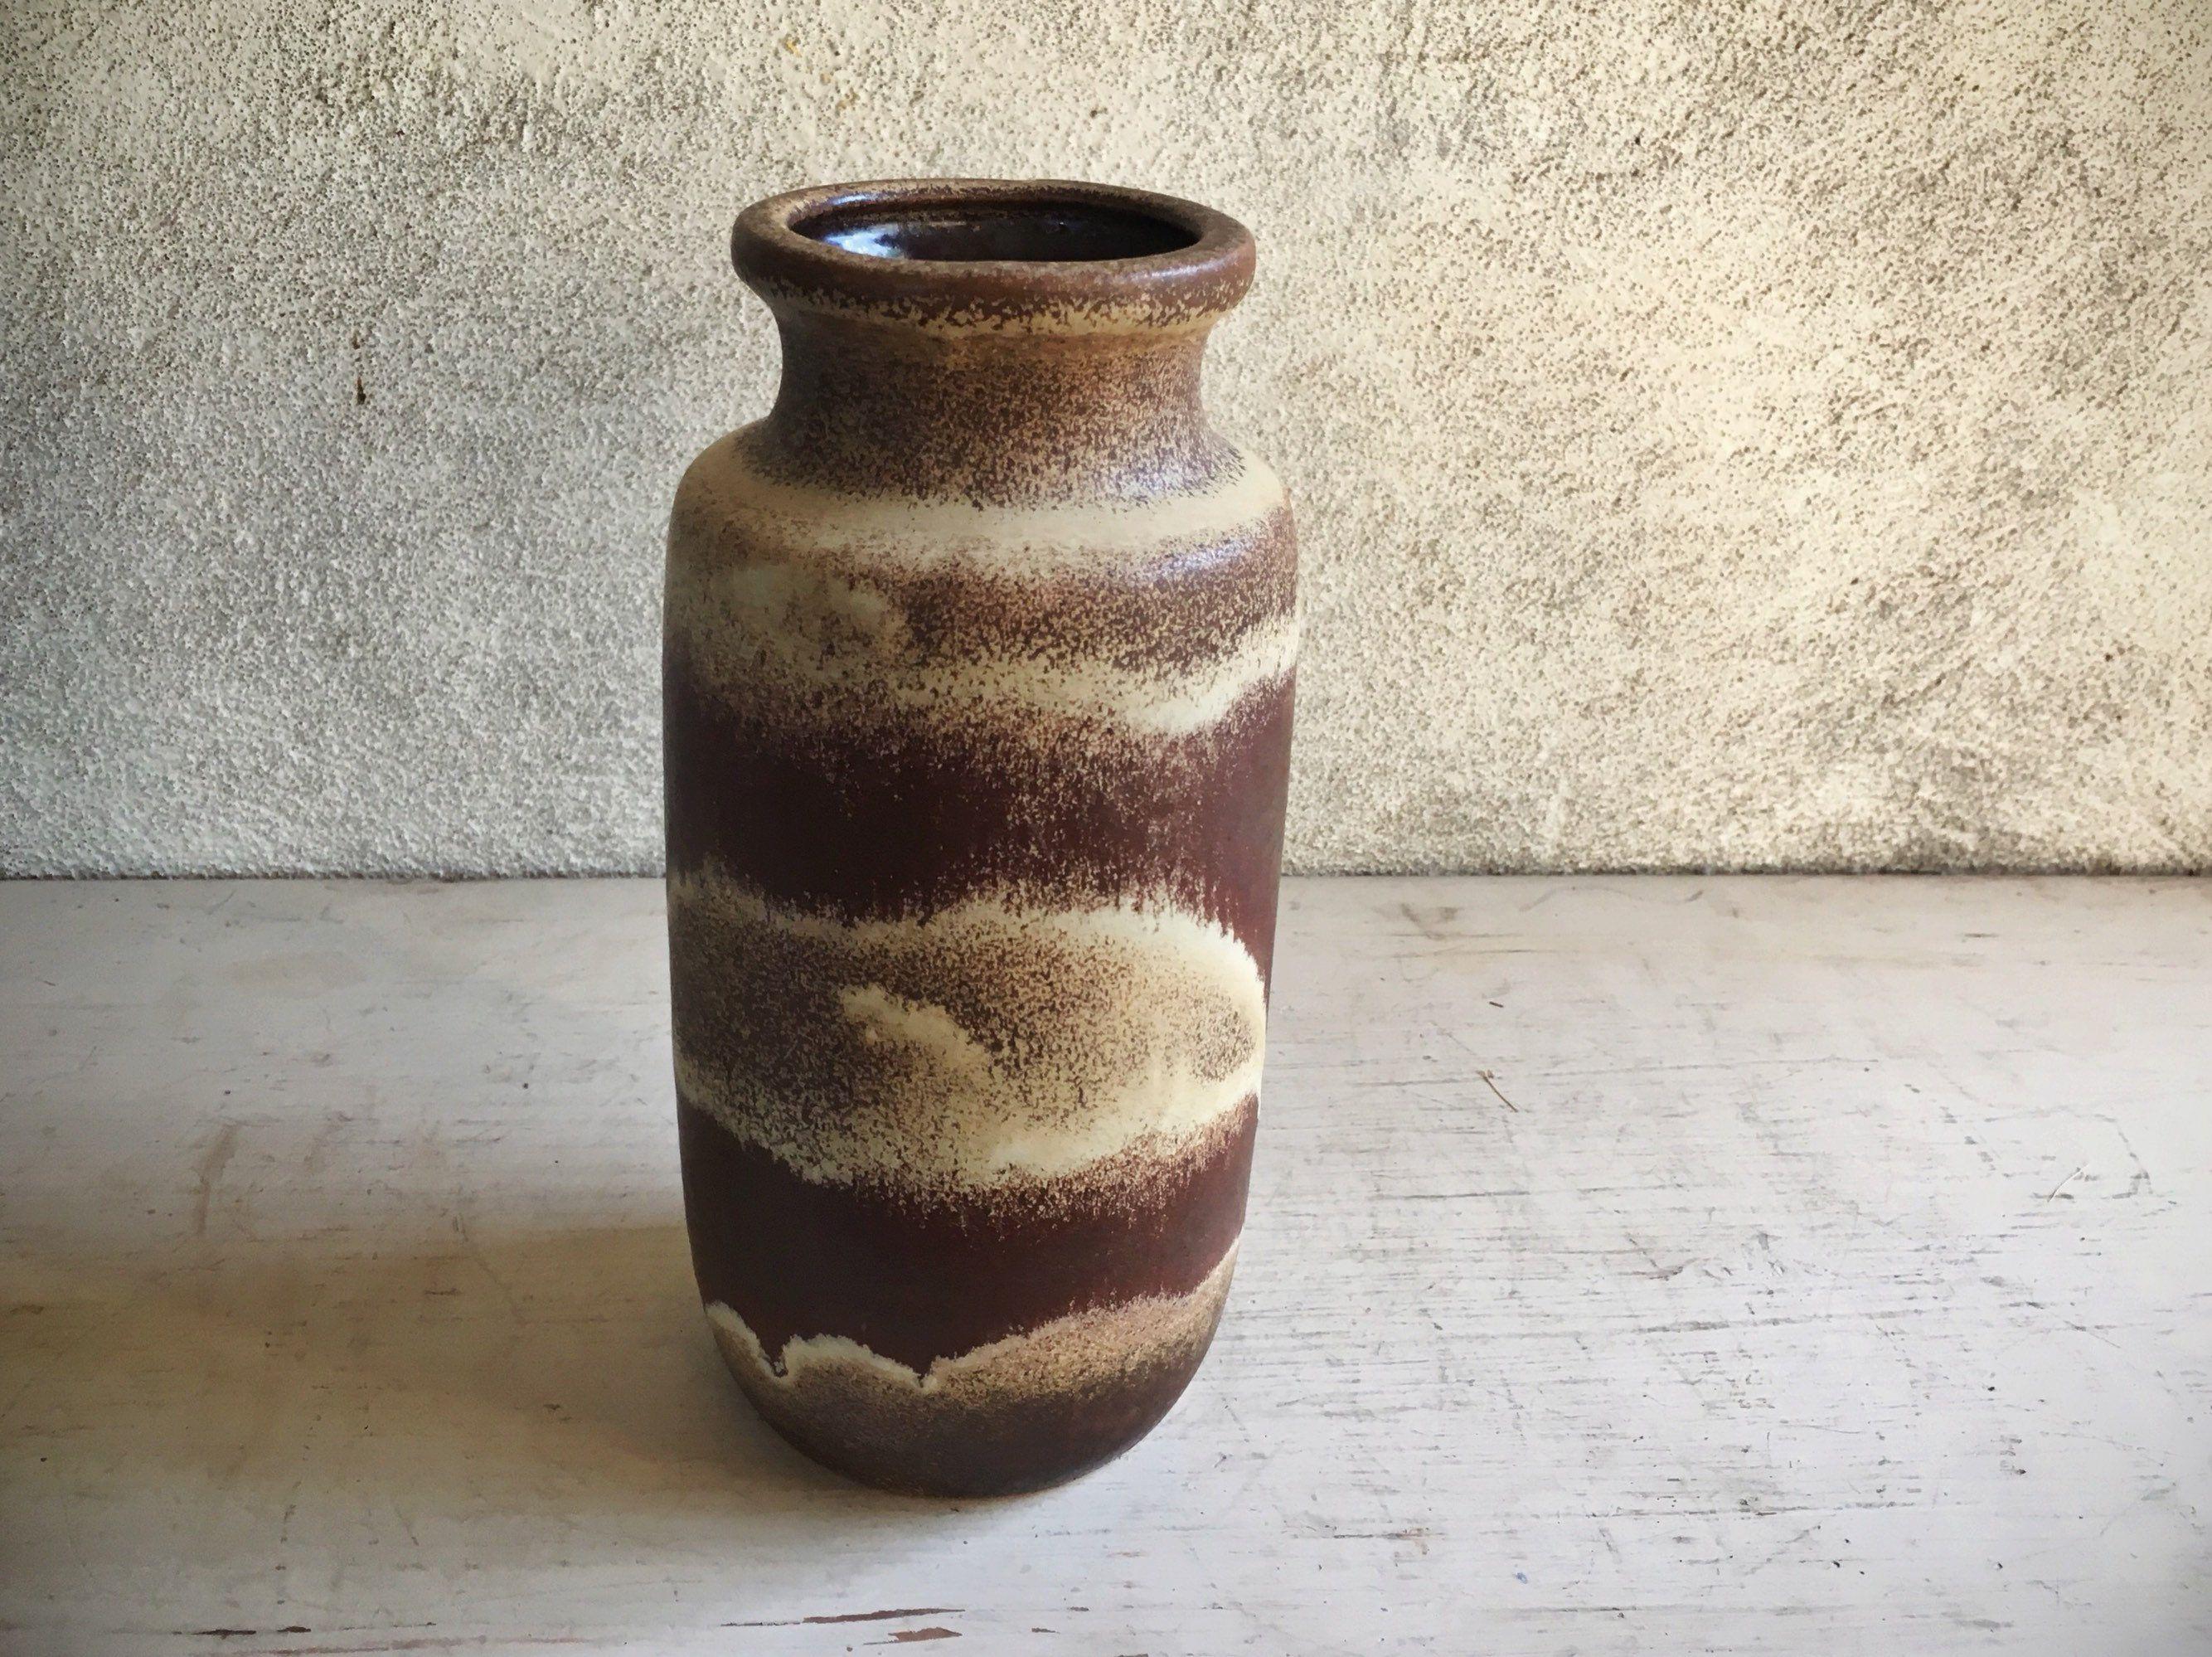 world market vases of 26 vase market coupon the weekly world inside mid century pottery west germany vase 213 20 scheurich keramik vase